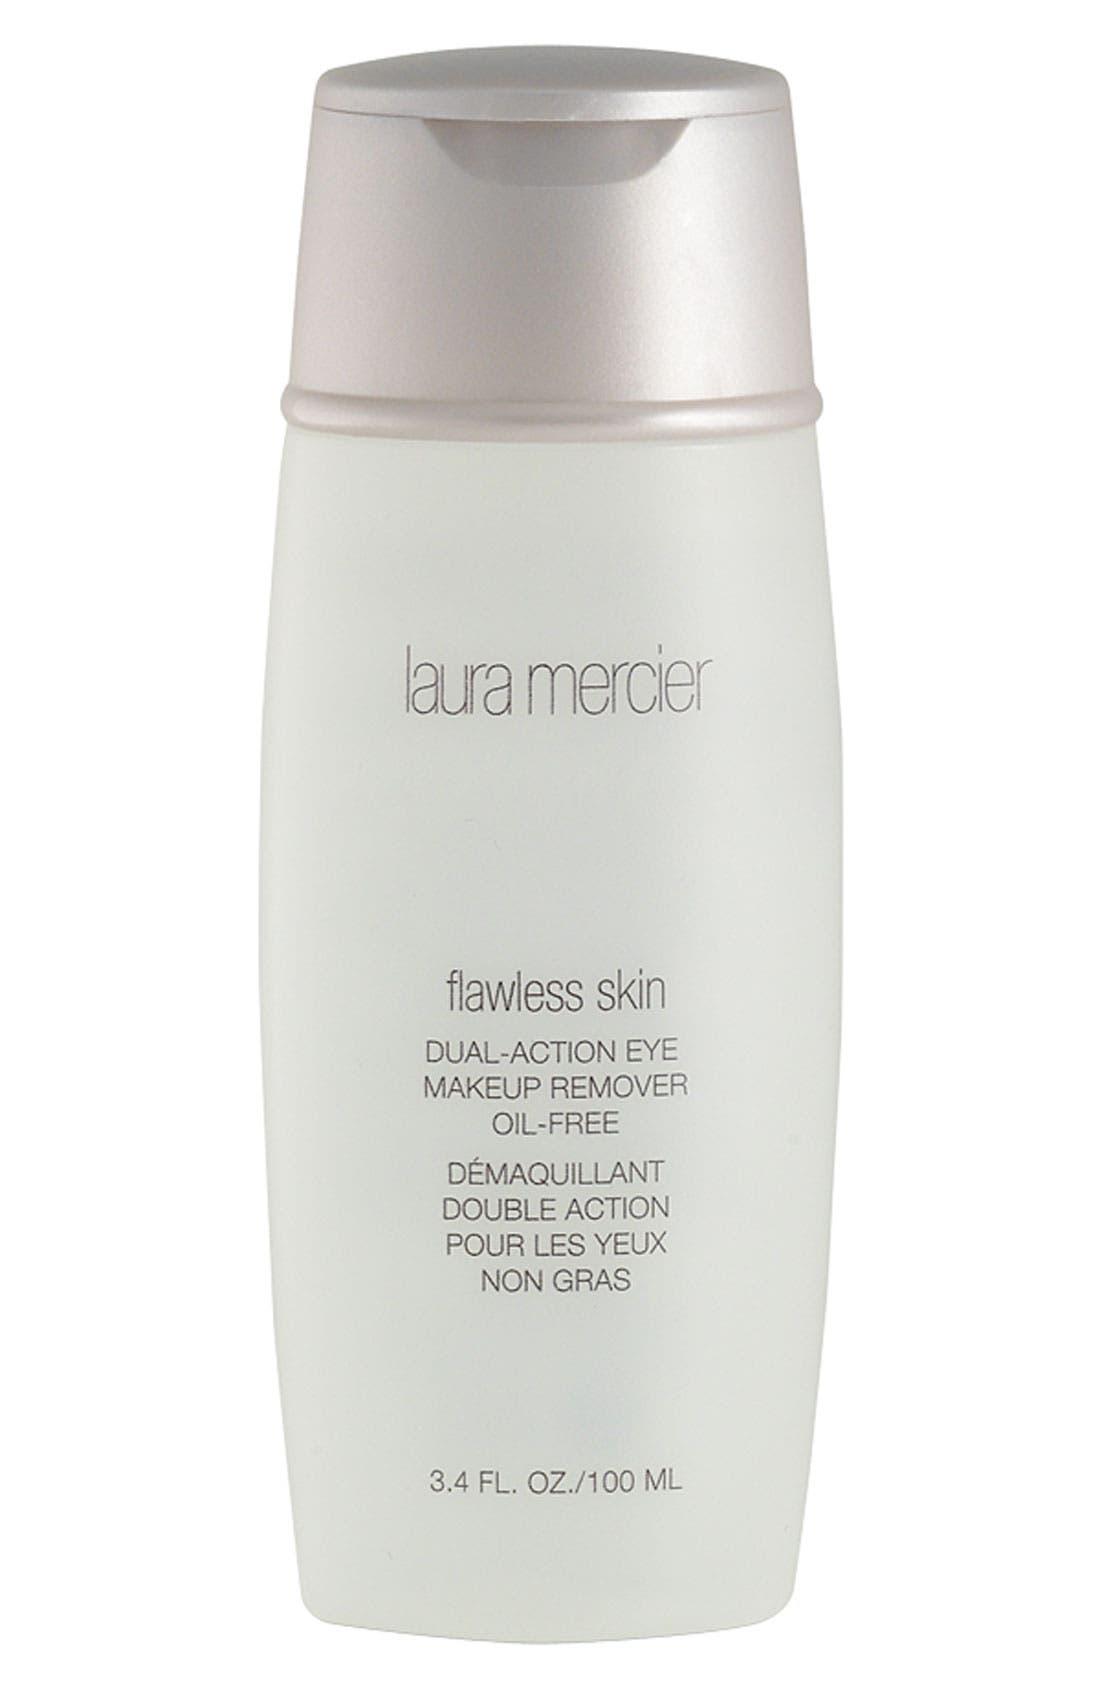 LAURA MERCIER, 'Flawless Skin' Dual-Action Eye Makeup Remover, Main thumbnail 1, color, NO COLOR